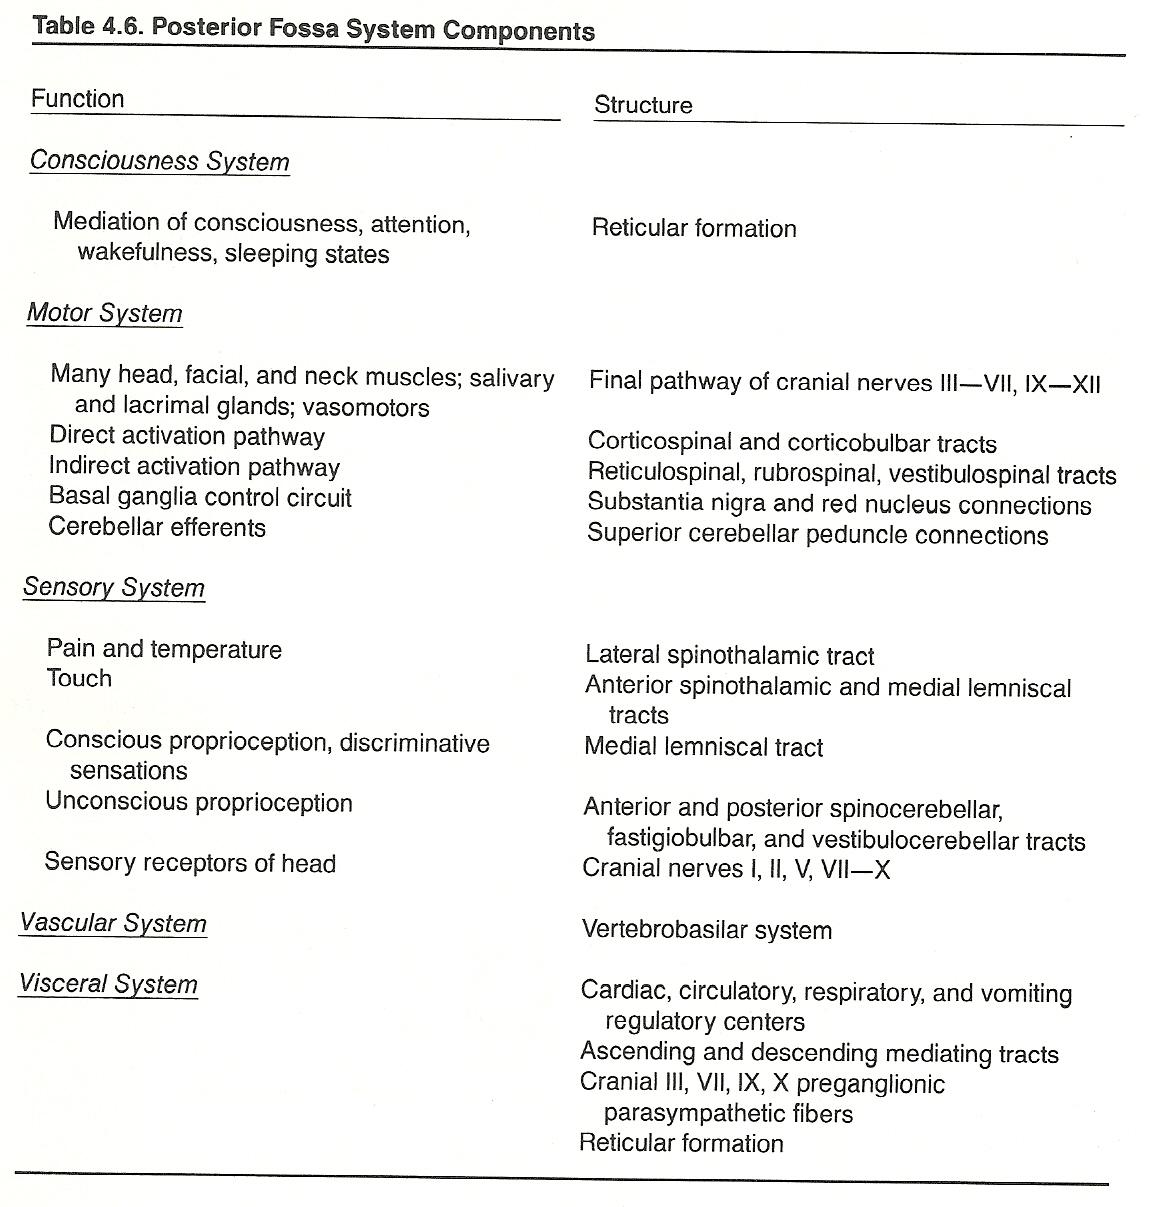 brain stem lesion symptoms CHAPTER 4. THE HORIZONTAL NEUROLOGIC LEVELS